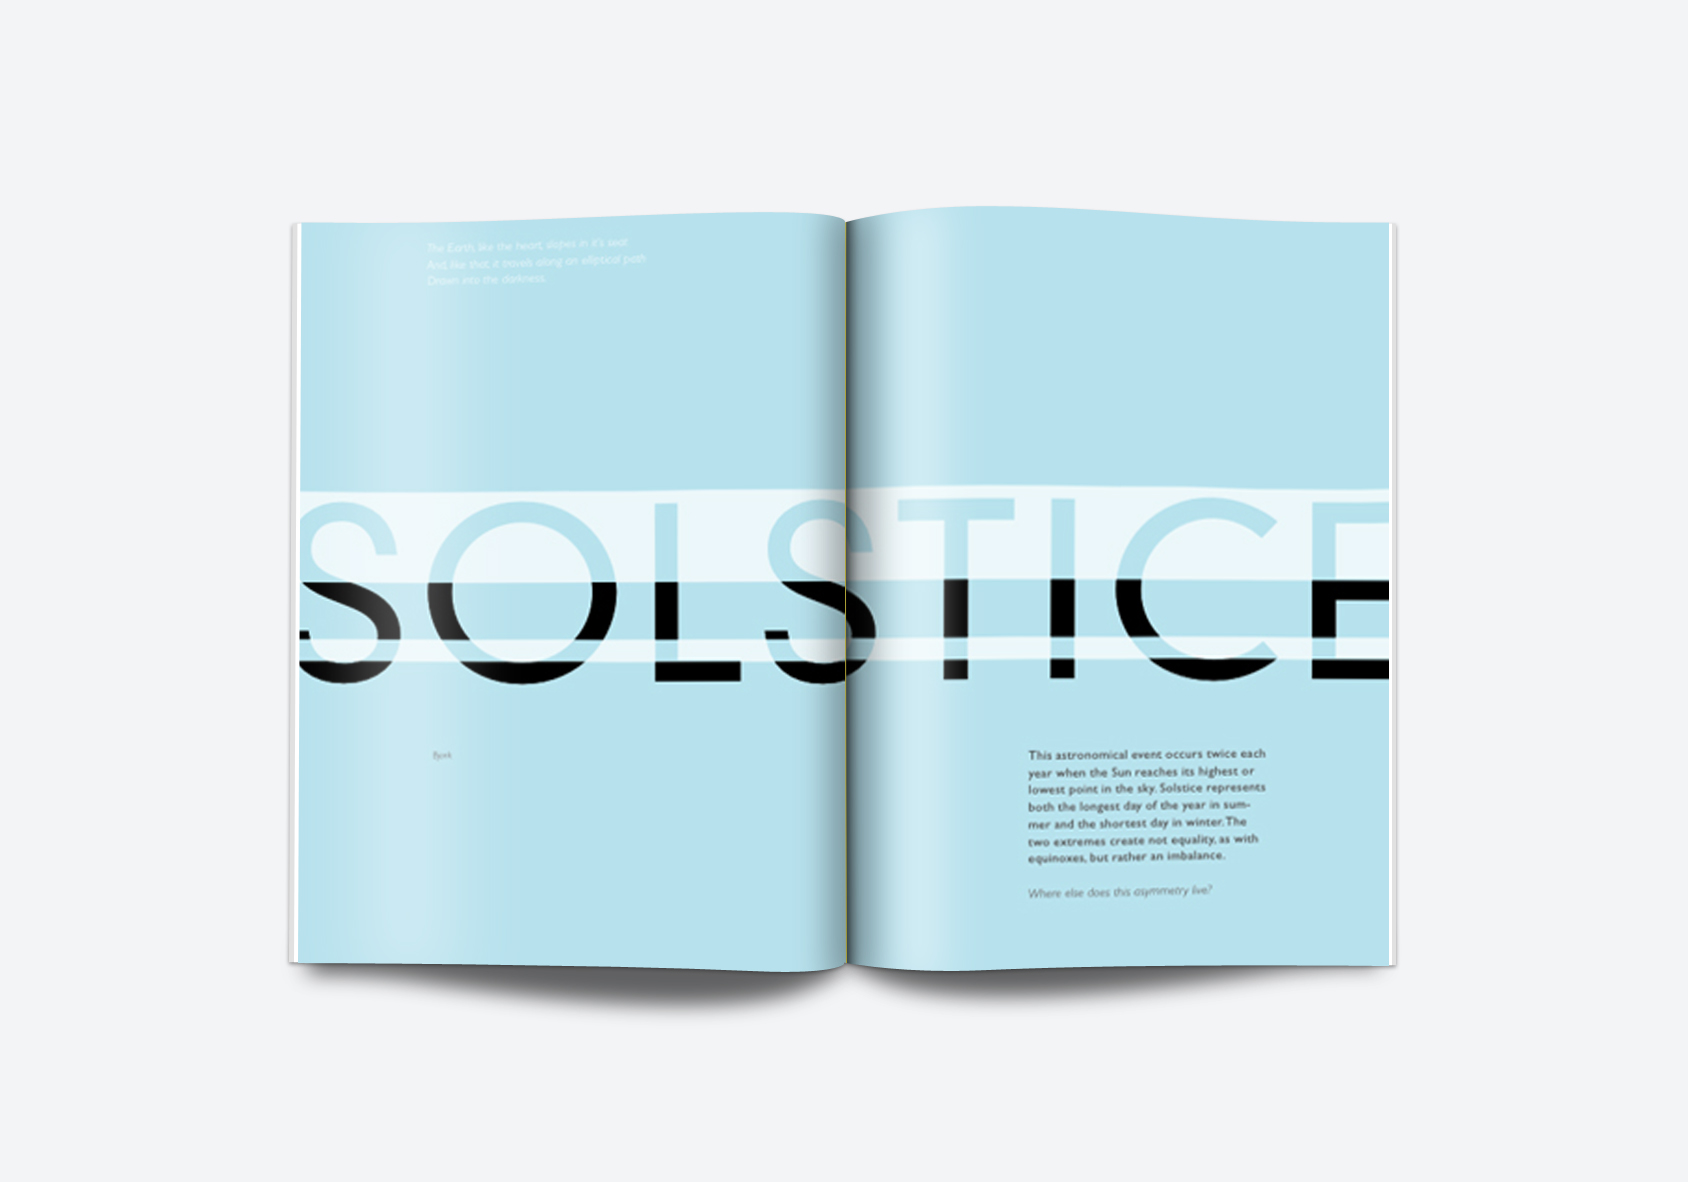 solstice-1.jpg